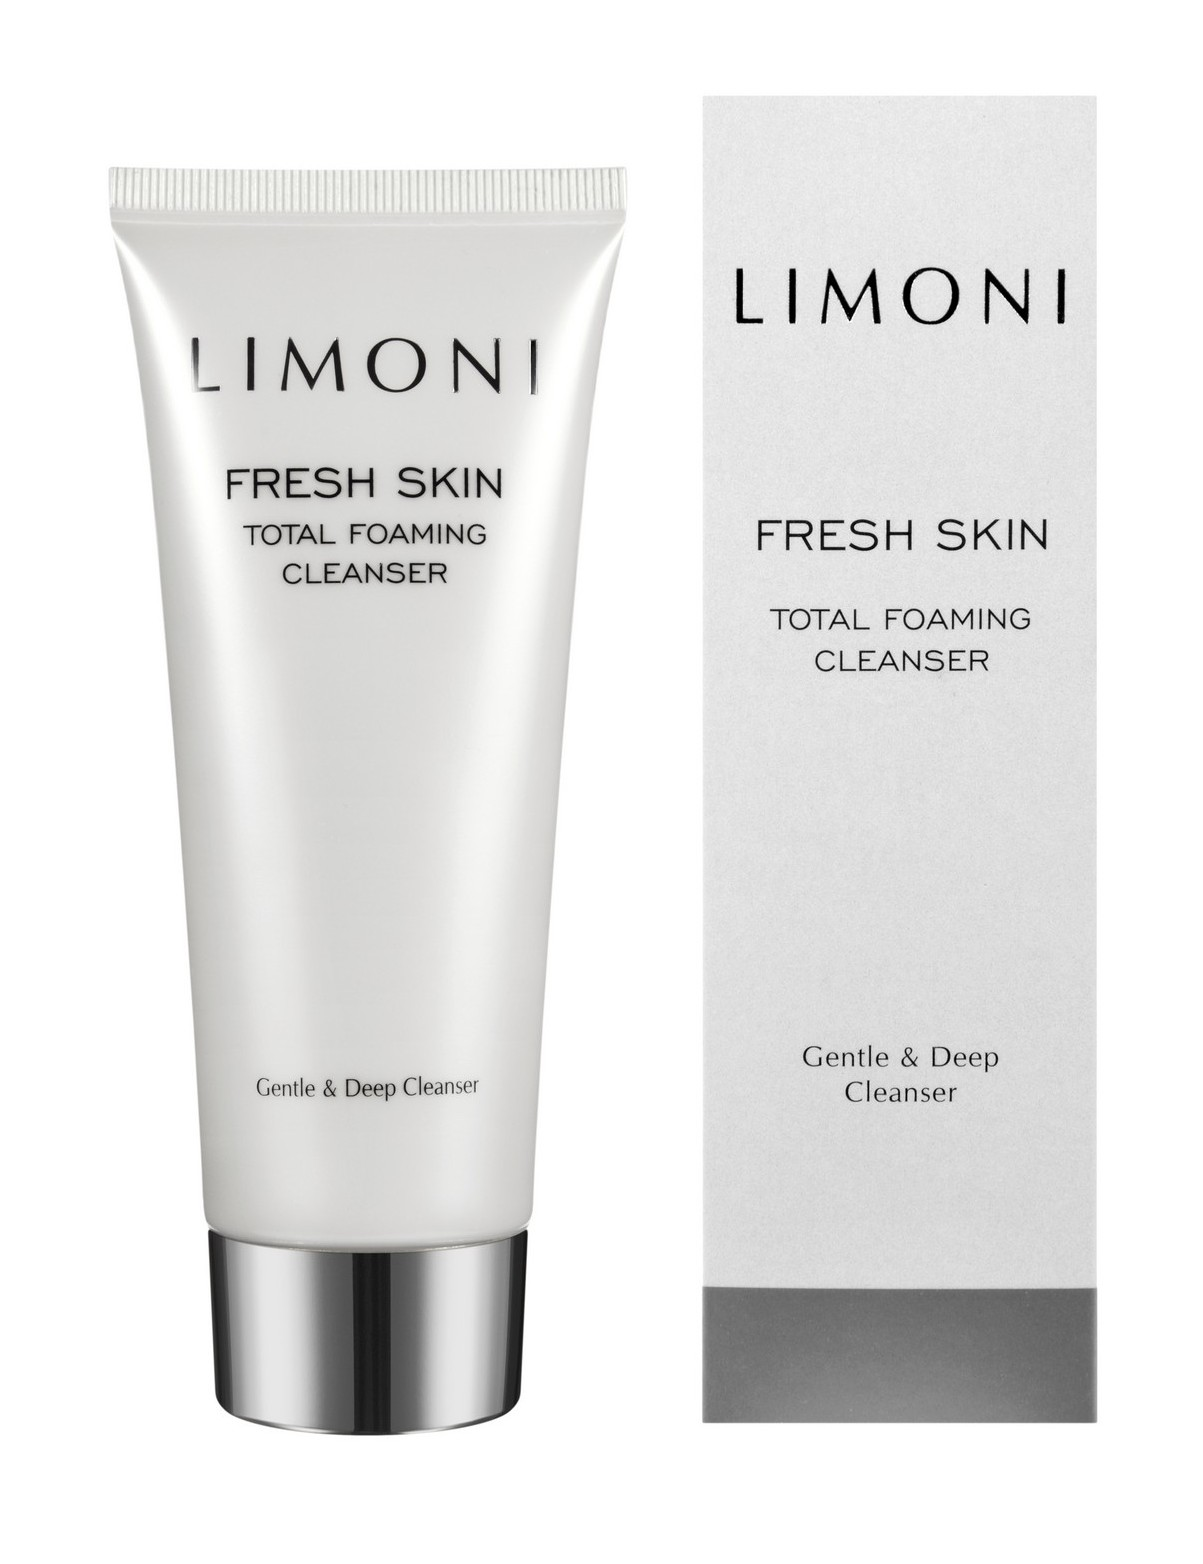 LIMONI Пенка для глубокого очищения кожи / Total Foaming Cleanser 100мл -  Пенки